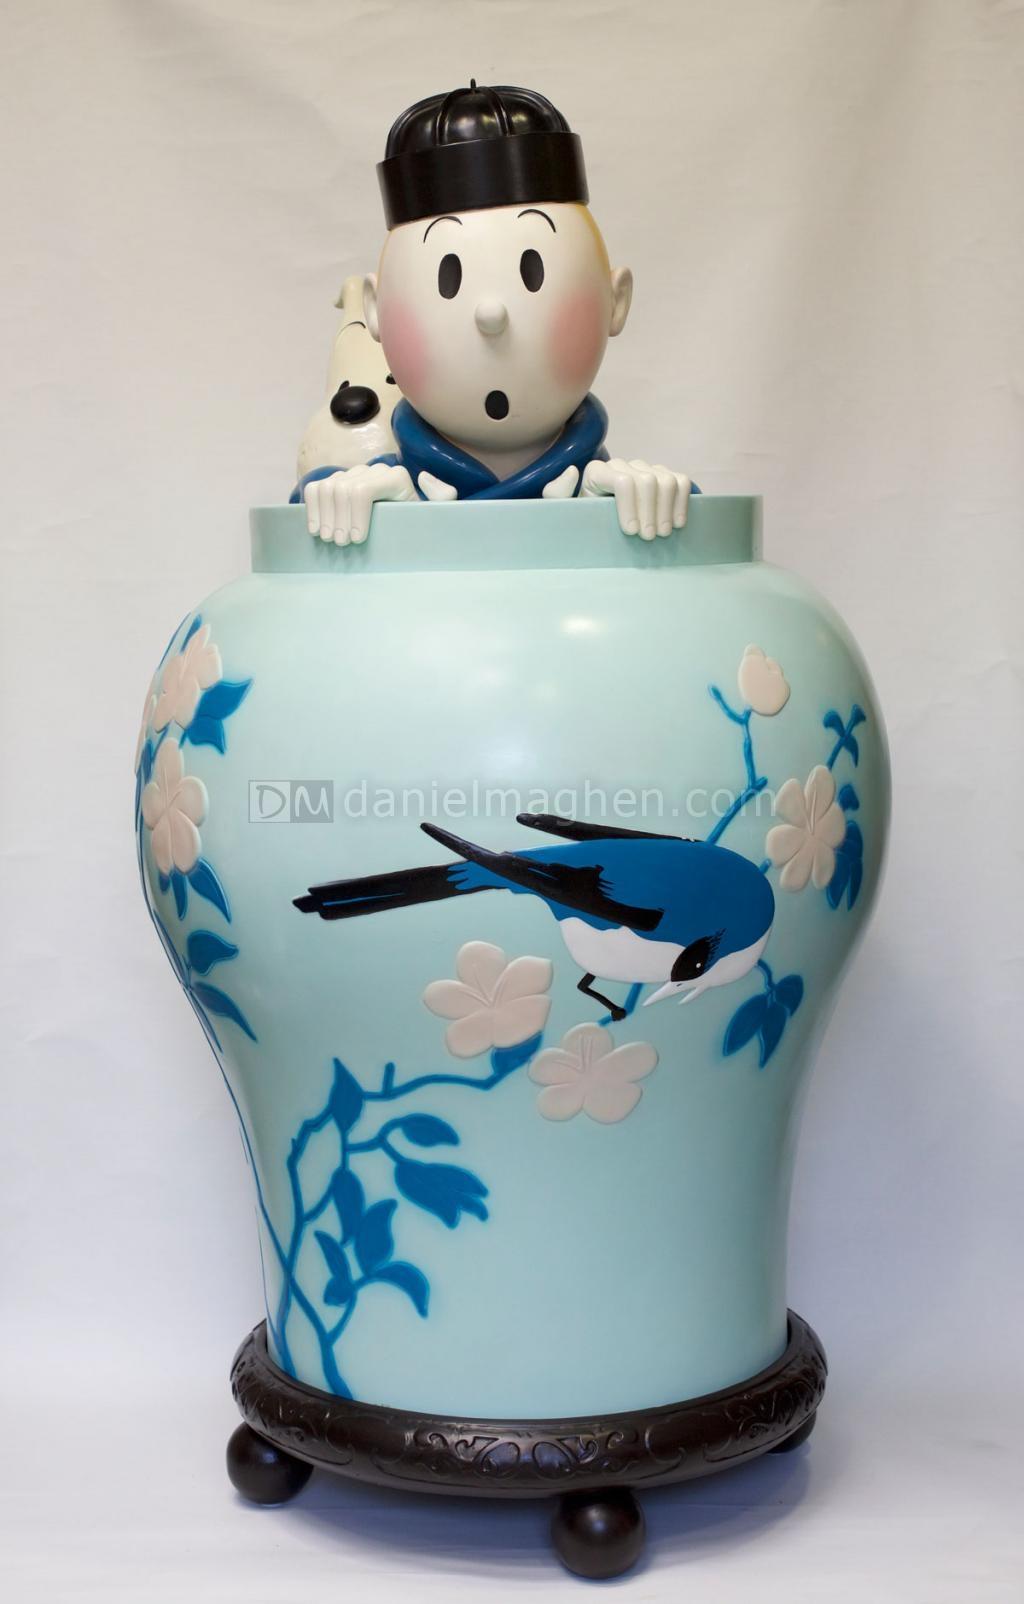 Lot 87 ¦ Jarre Tintin en plâtre polychrome.